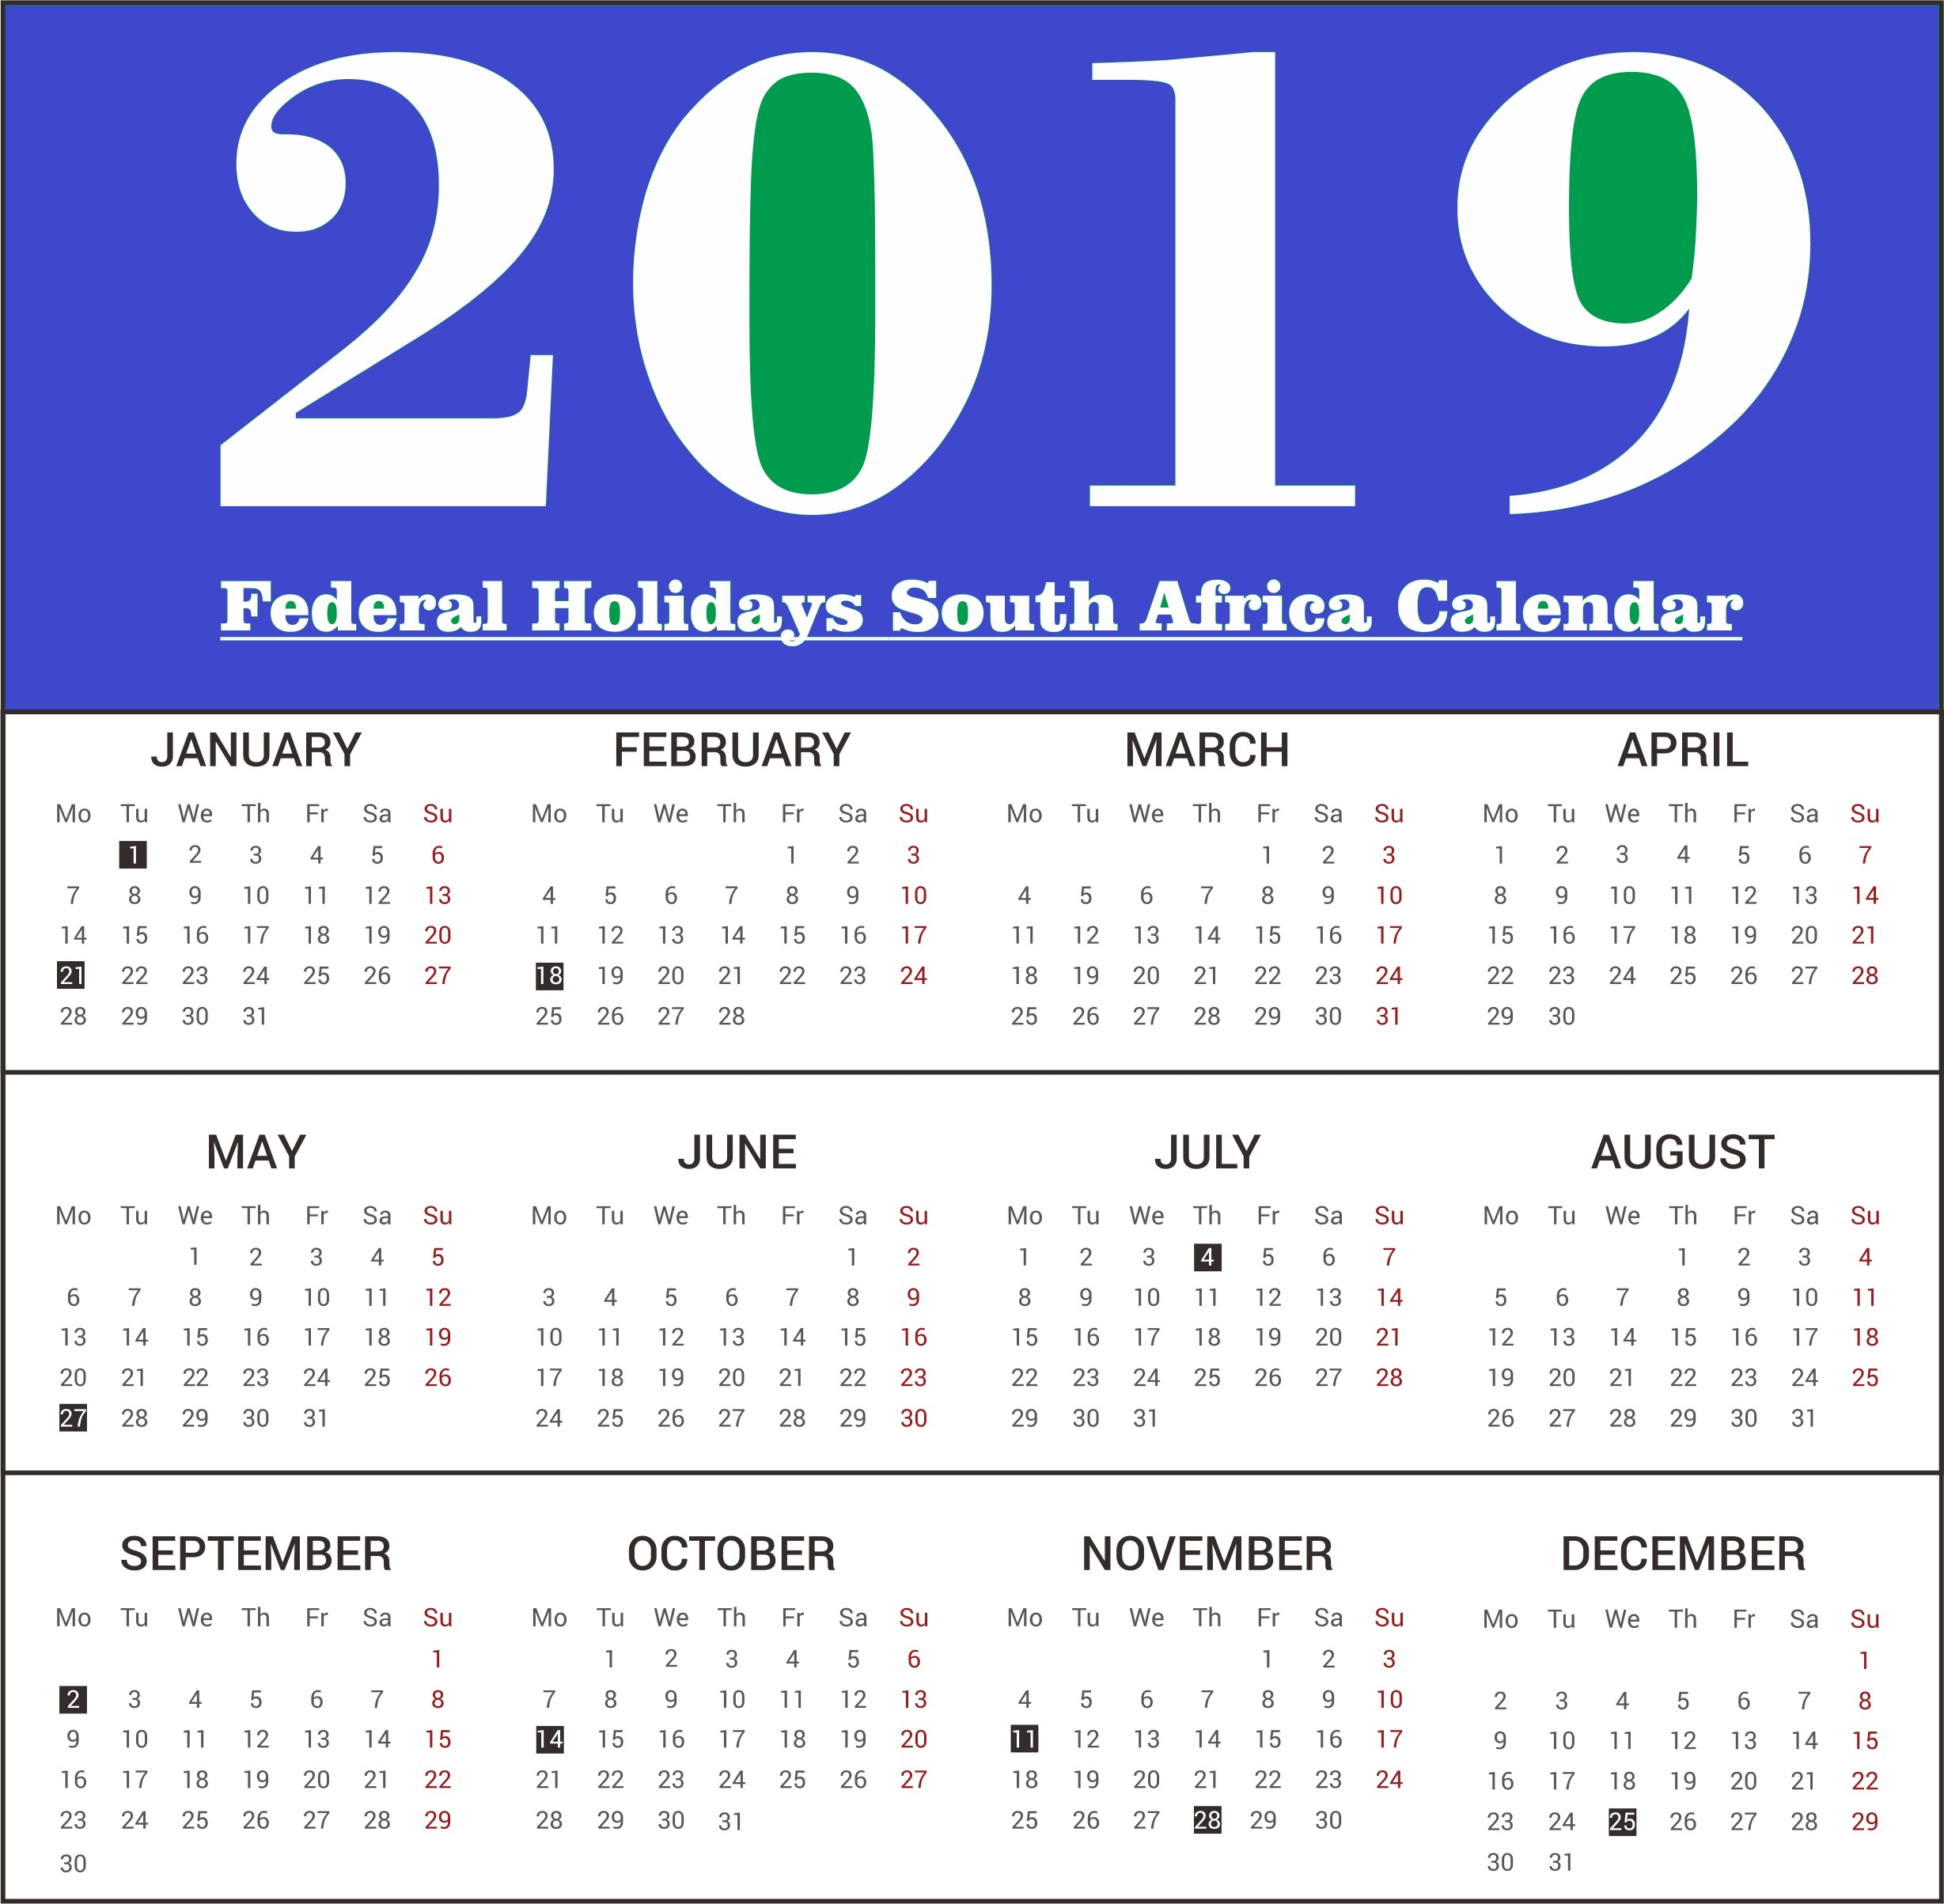 2019 south africa federal holidays calendar